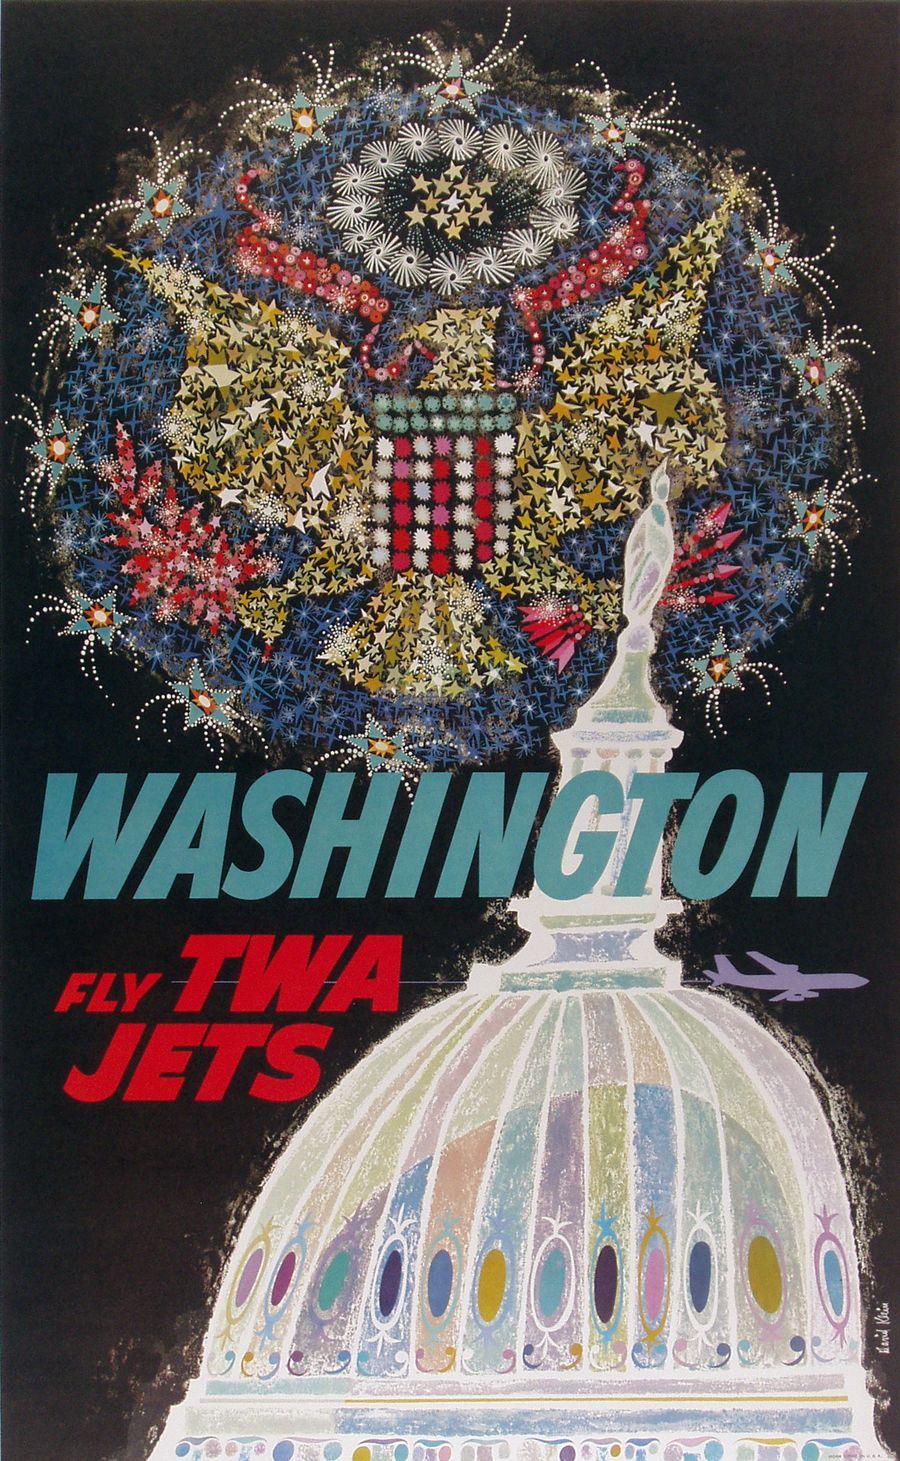 c.1965 #Washington, D.C. -- Fly TWA. Artist: David #Klein. #poster #ephemera #TWA